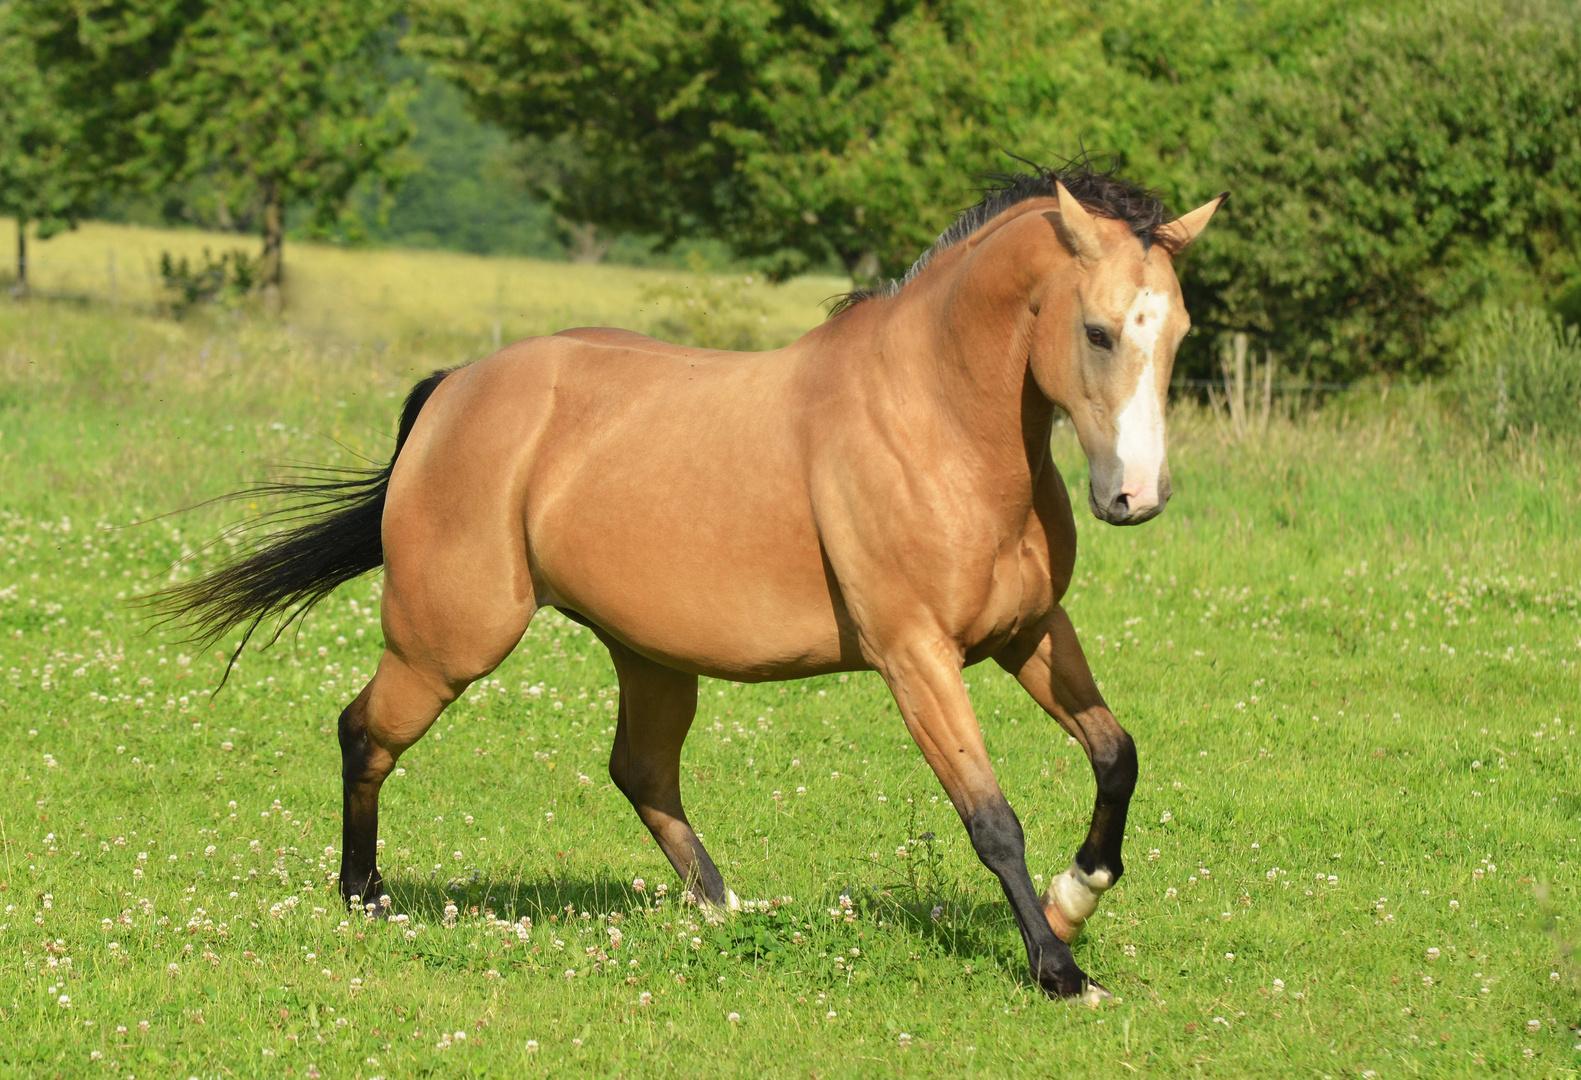 Expressive Quarter Horse